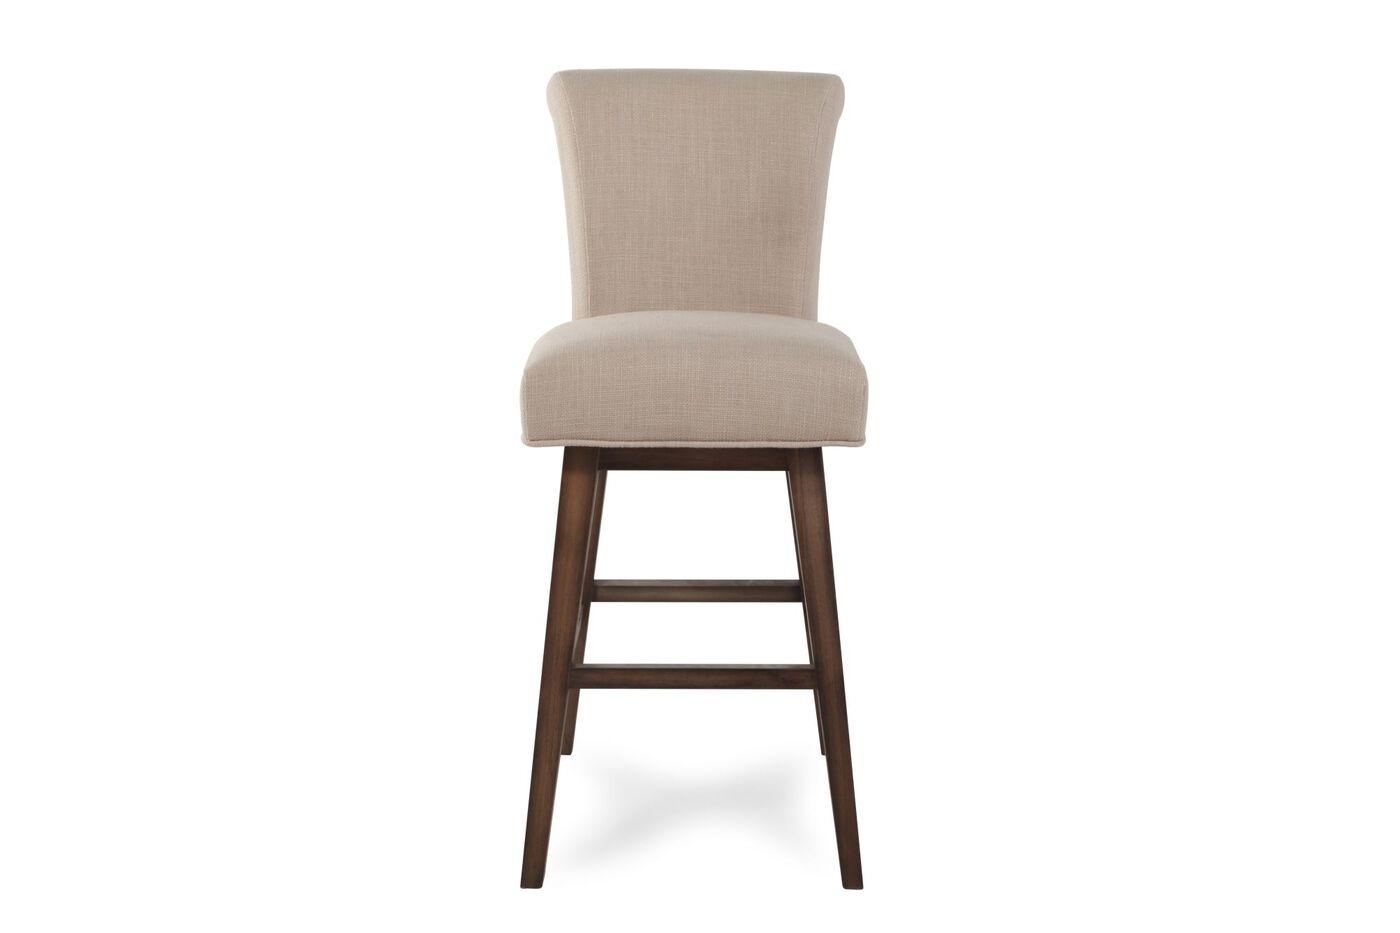 Boulevard Beige Swivel Bar Stool Mathis Brothers Furniture